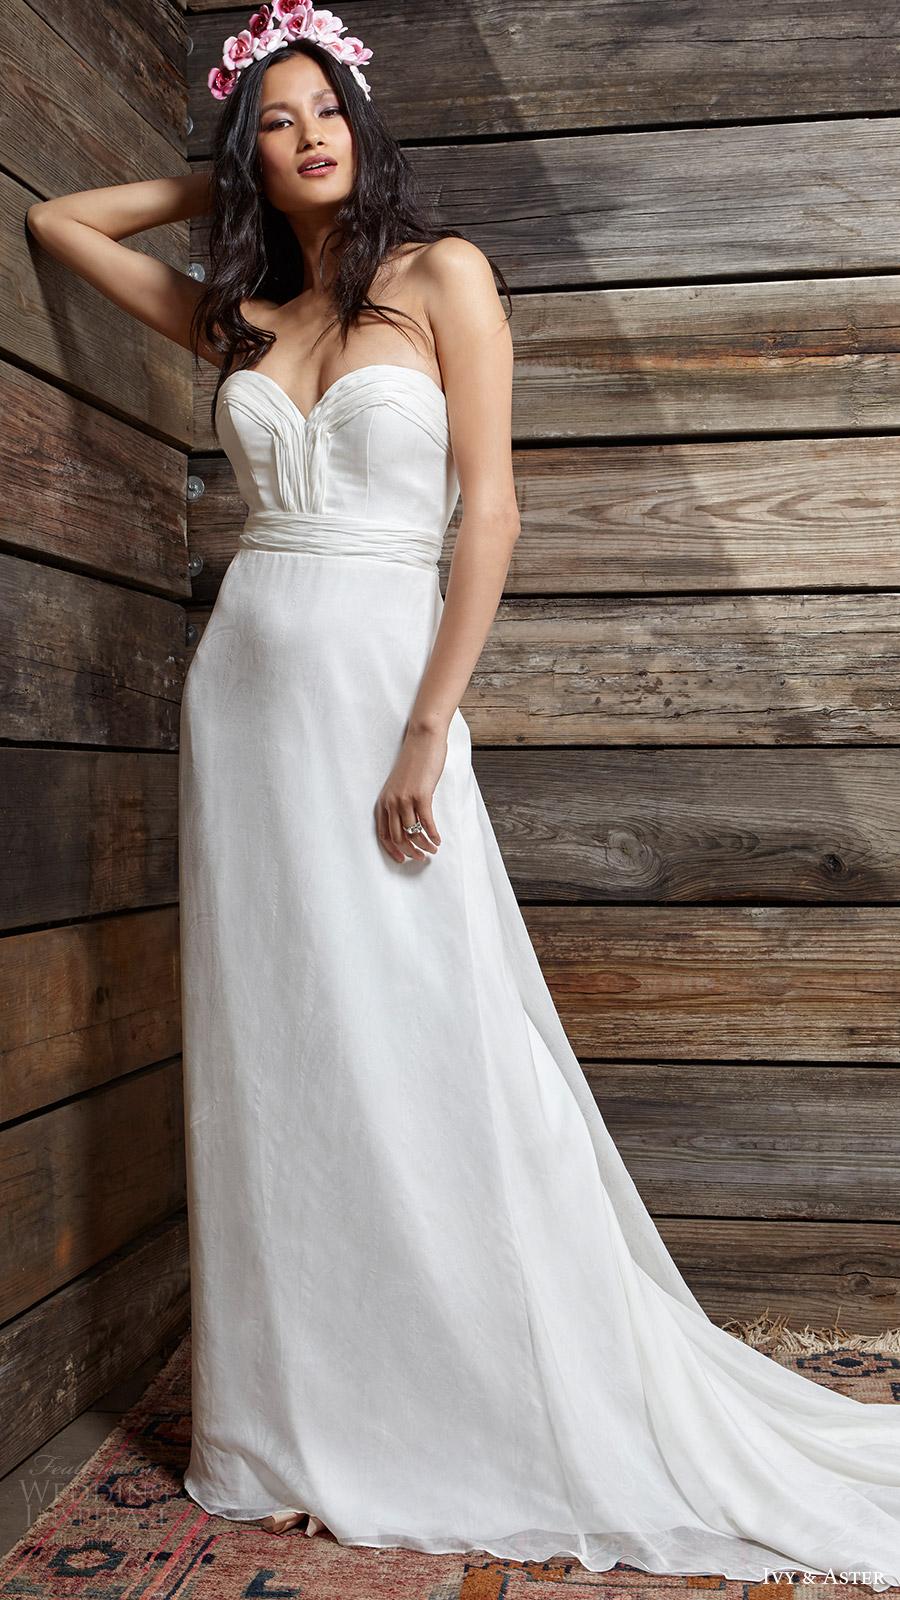 Amelie Wedding Dress 52 Fresh ivy aster bridal spring